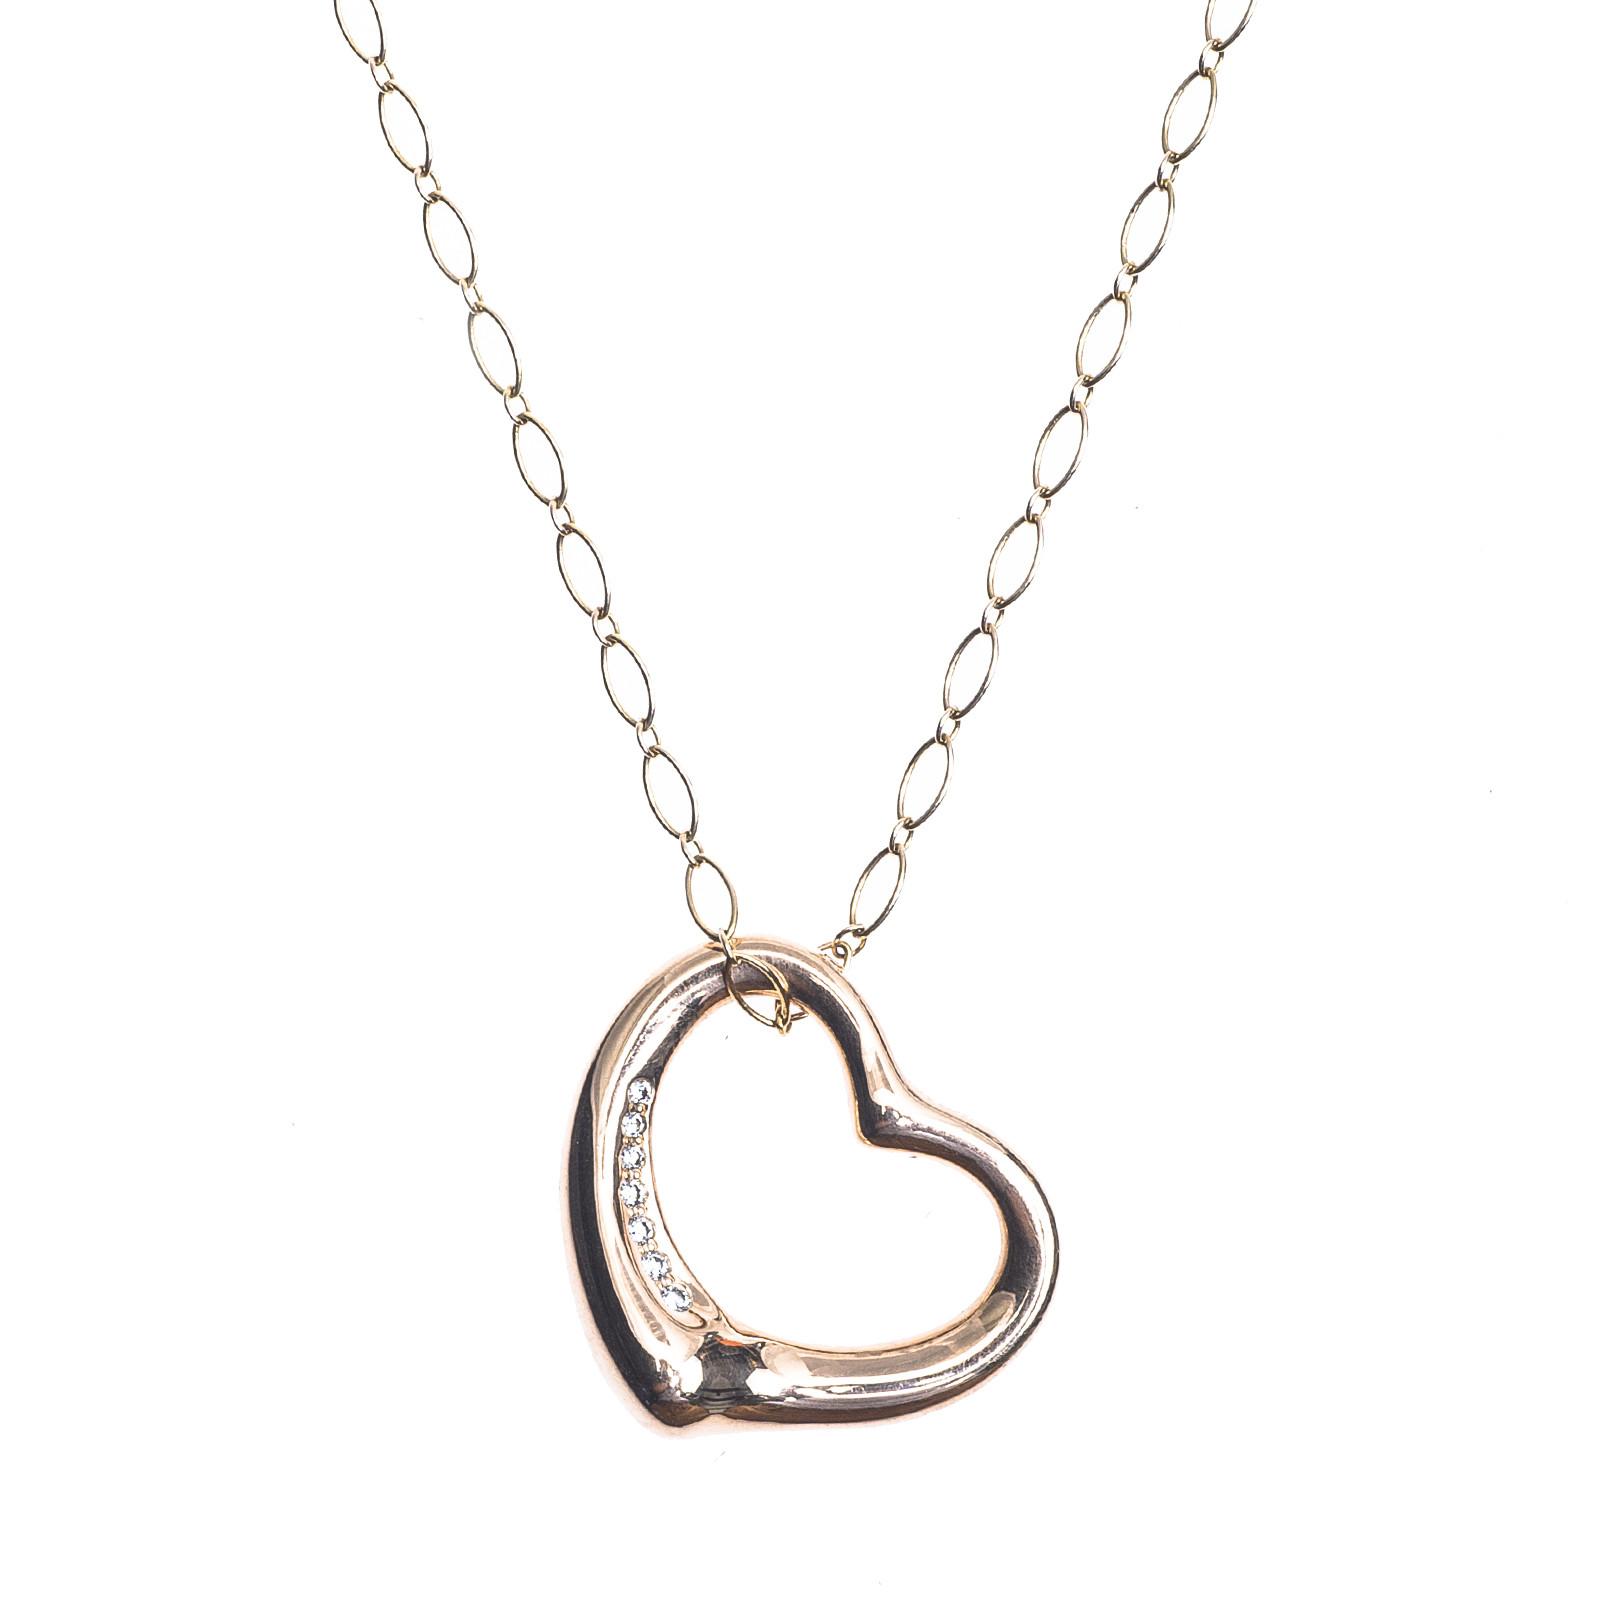 Vintage tiffany co 010 ctw diamond elsa peretti open heart vintage tiffany co 010 ctw diamond elsa peretti open heart necklace aloadofball Choice Image